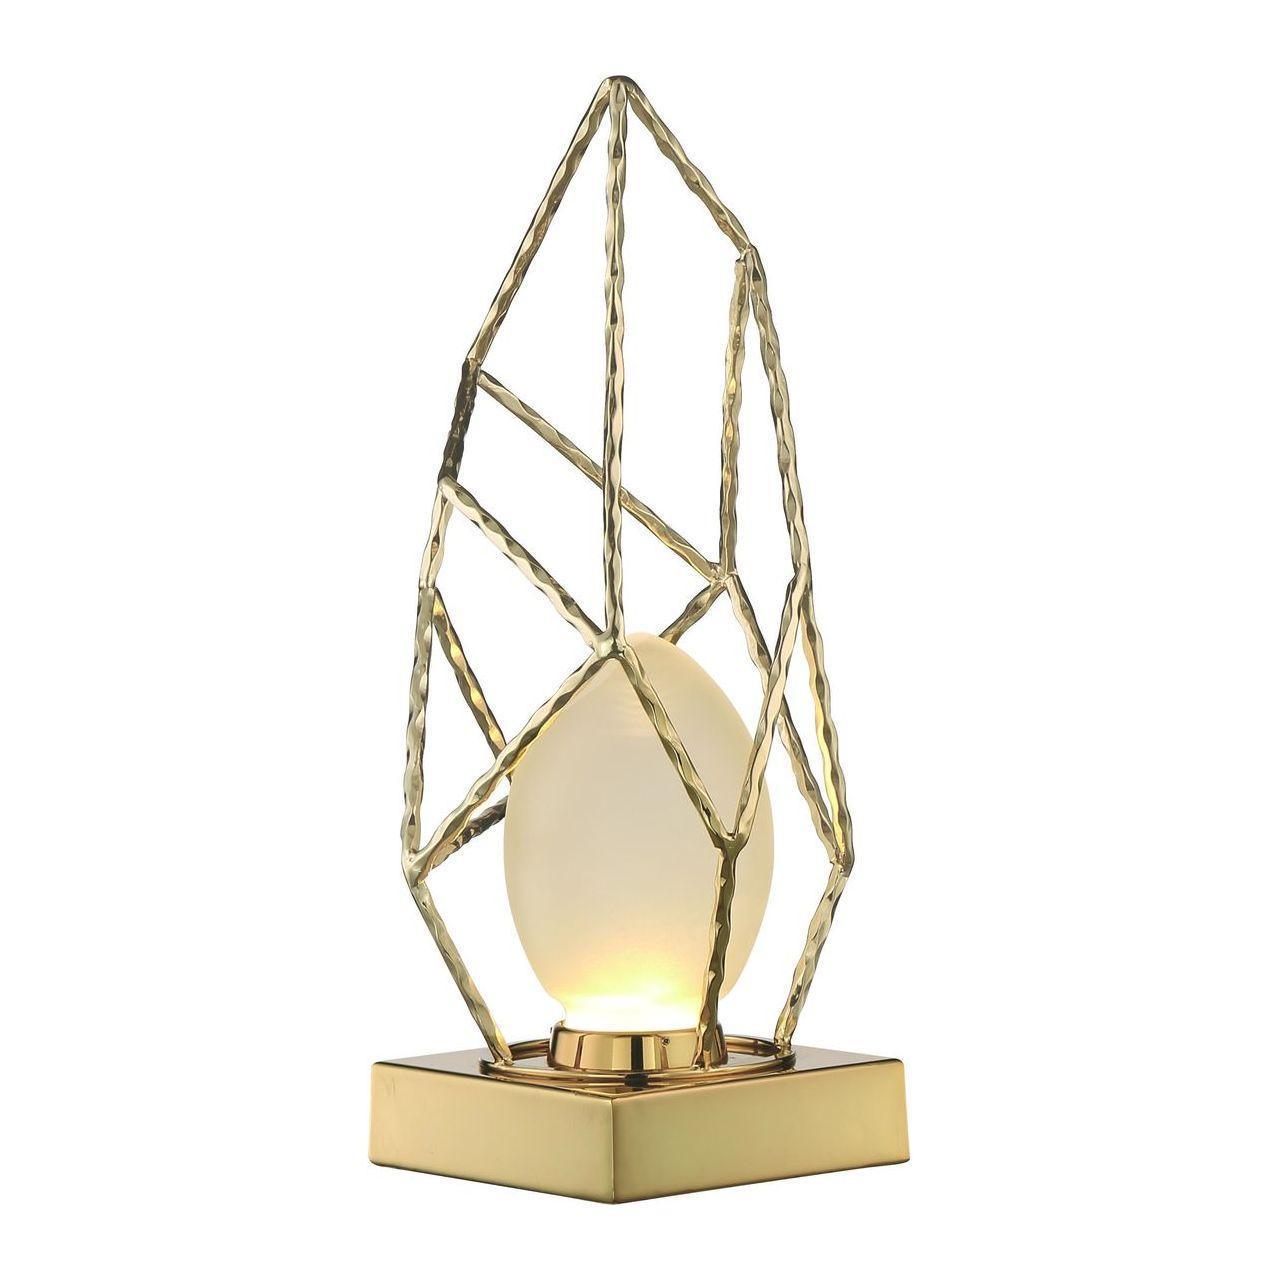 Настольная лампа Lucia Tucci Naomi T4750.1 Gold настольная лампа lucia tucci harrods t944 1